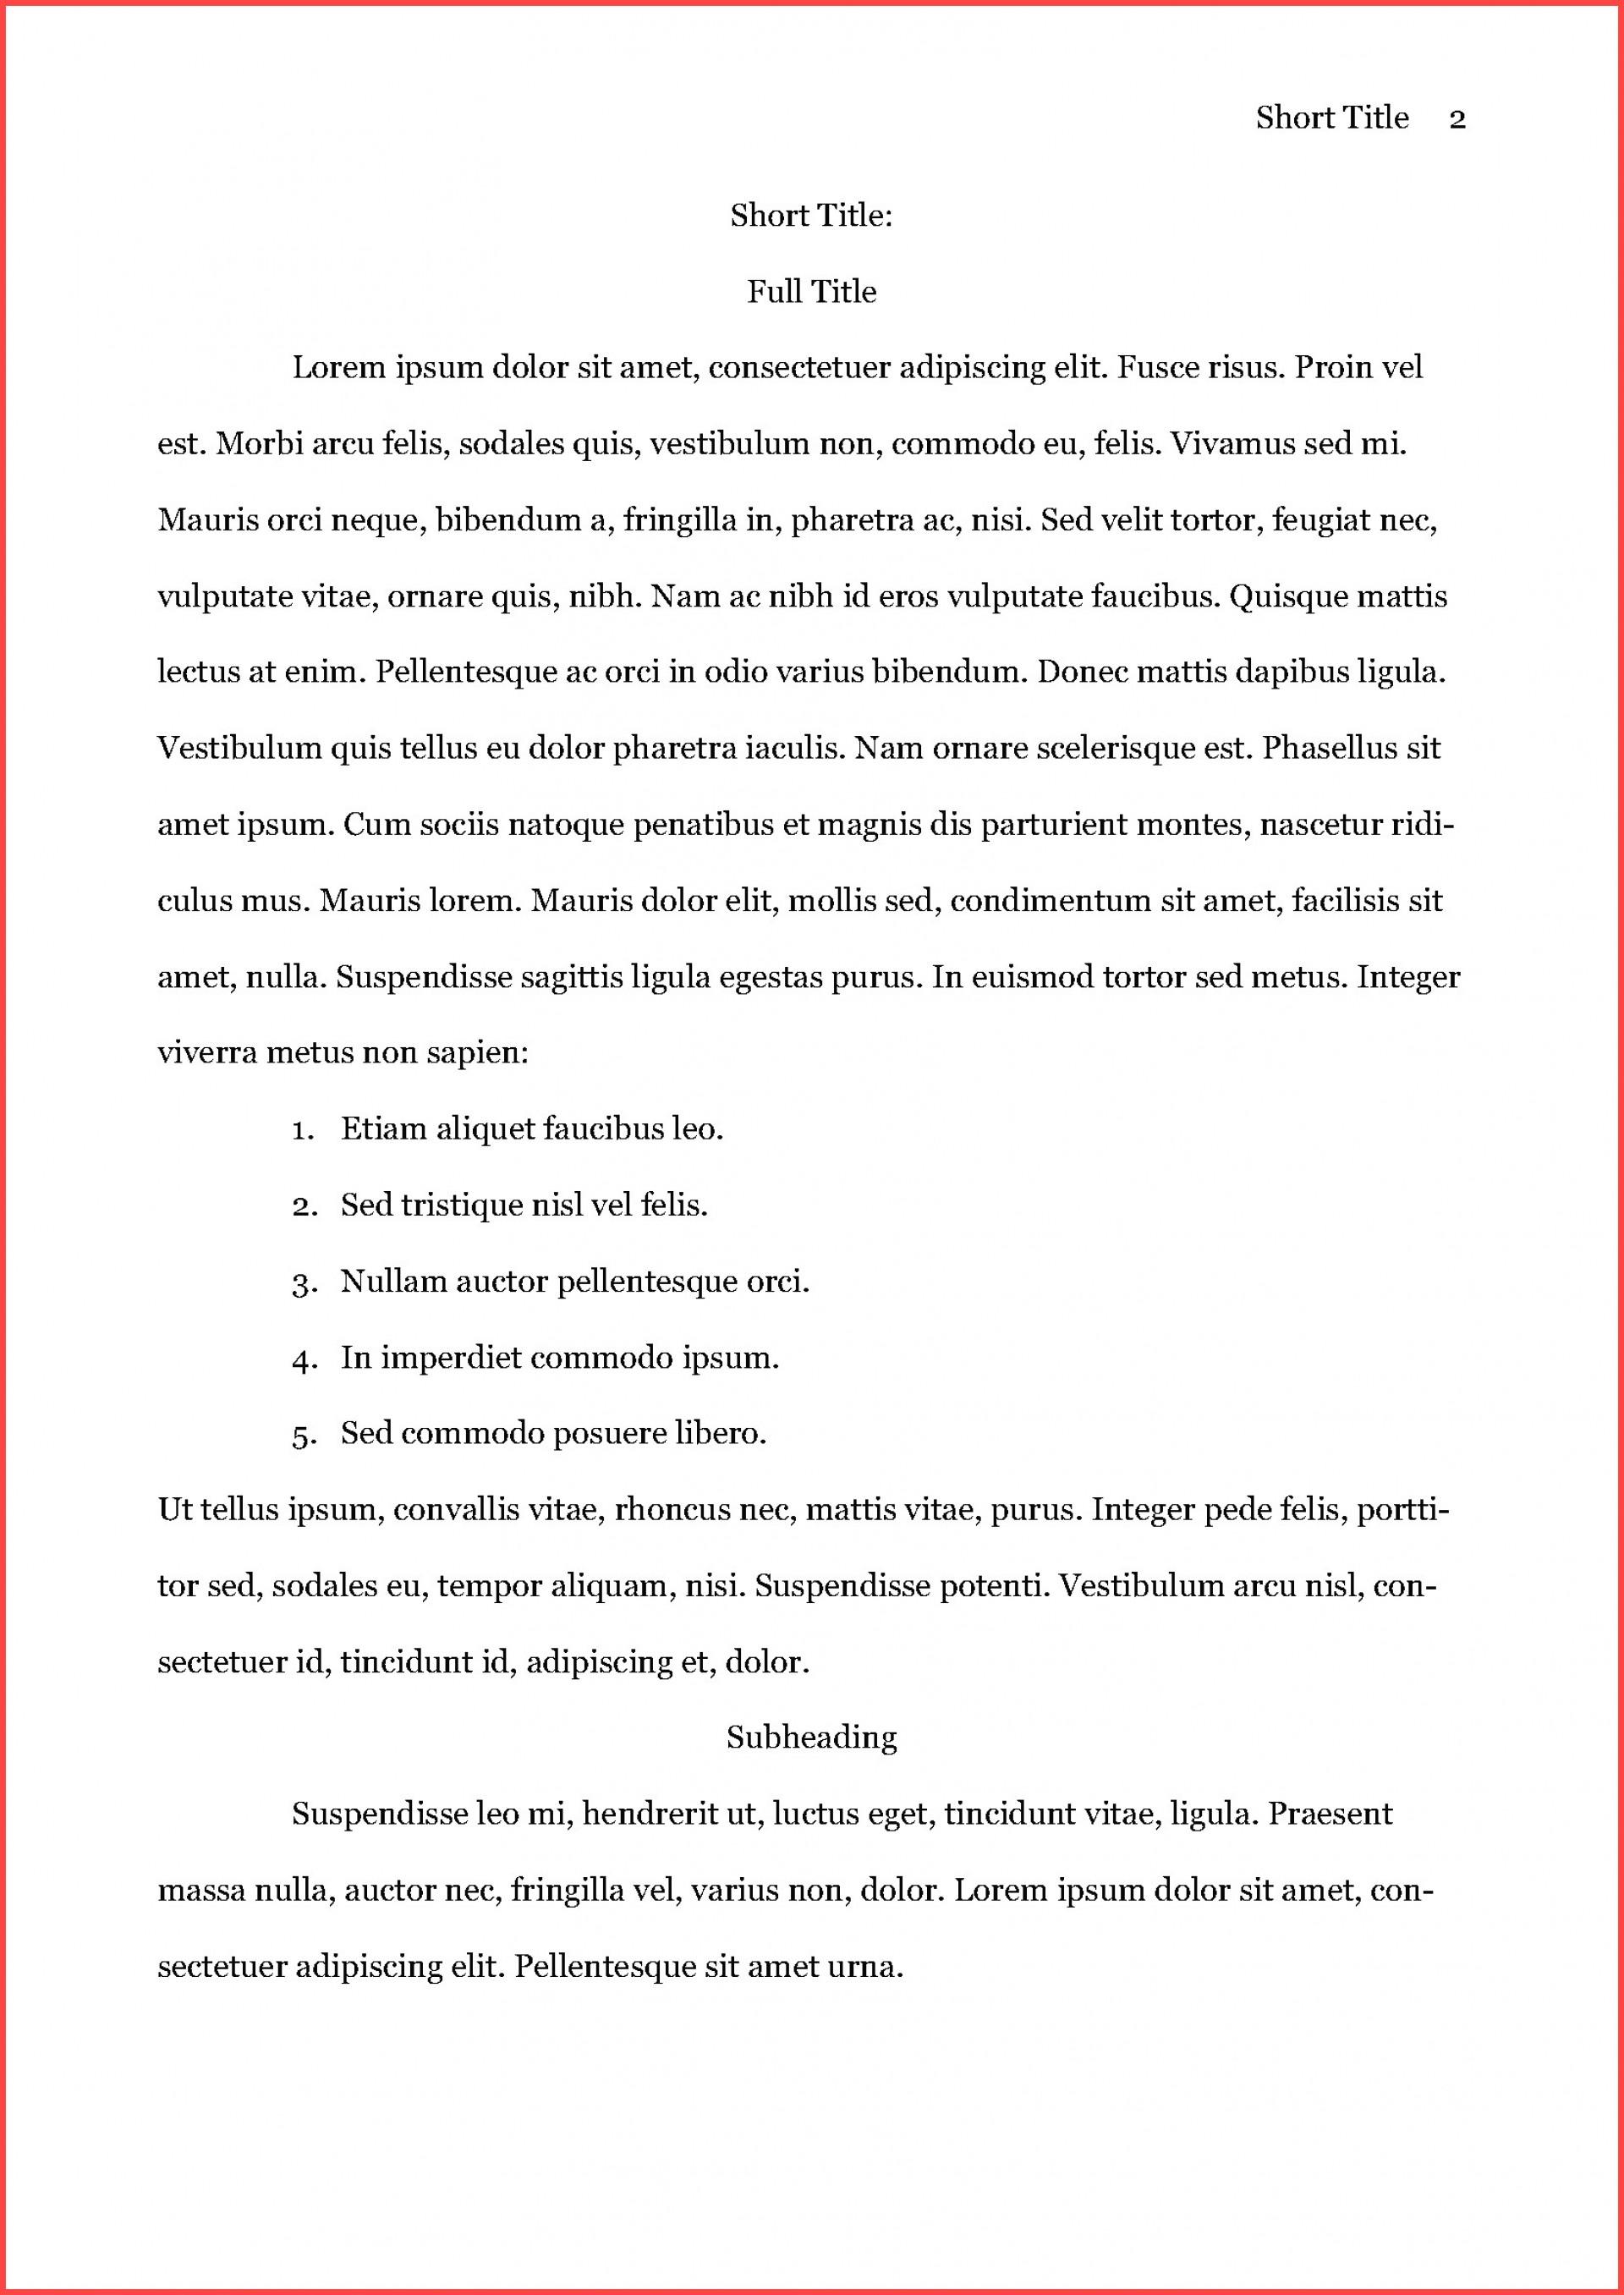 003 Asa Format Example Remarkable Essay Reference Generator Heading Citation 1920